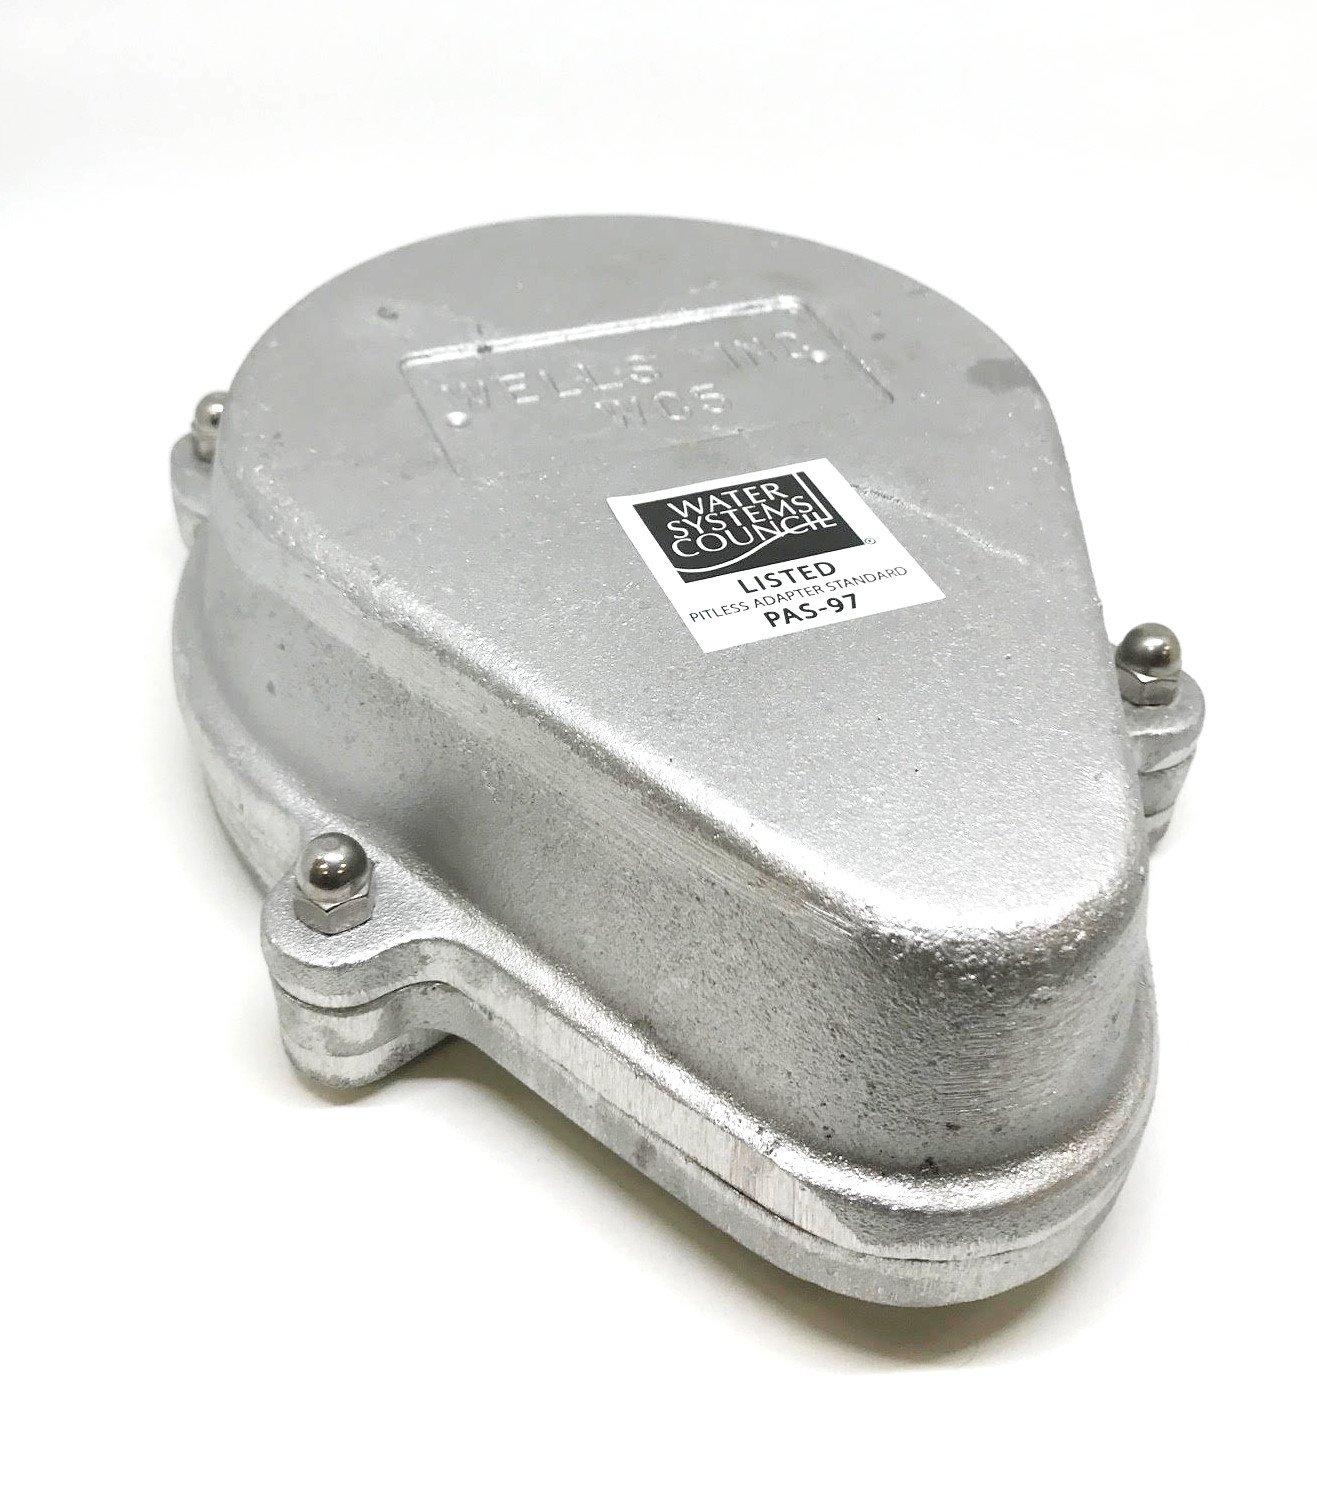 Campbell Mfg WT5 5'' Aluminum Watertight Well Cap for 5-9/16'' OD Casings